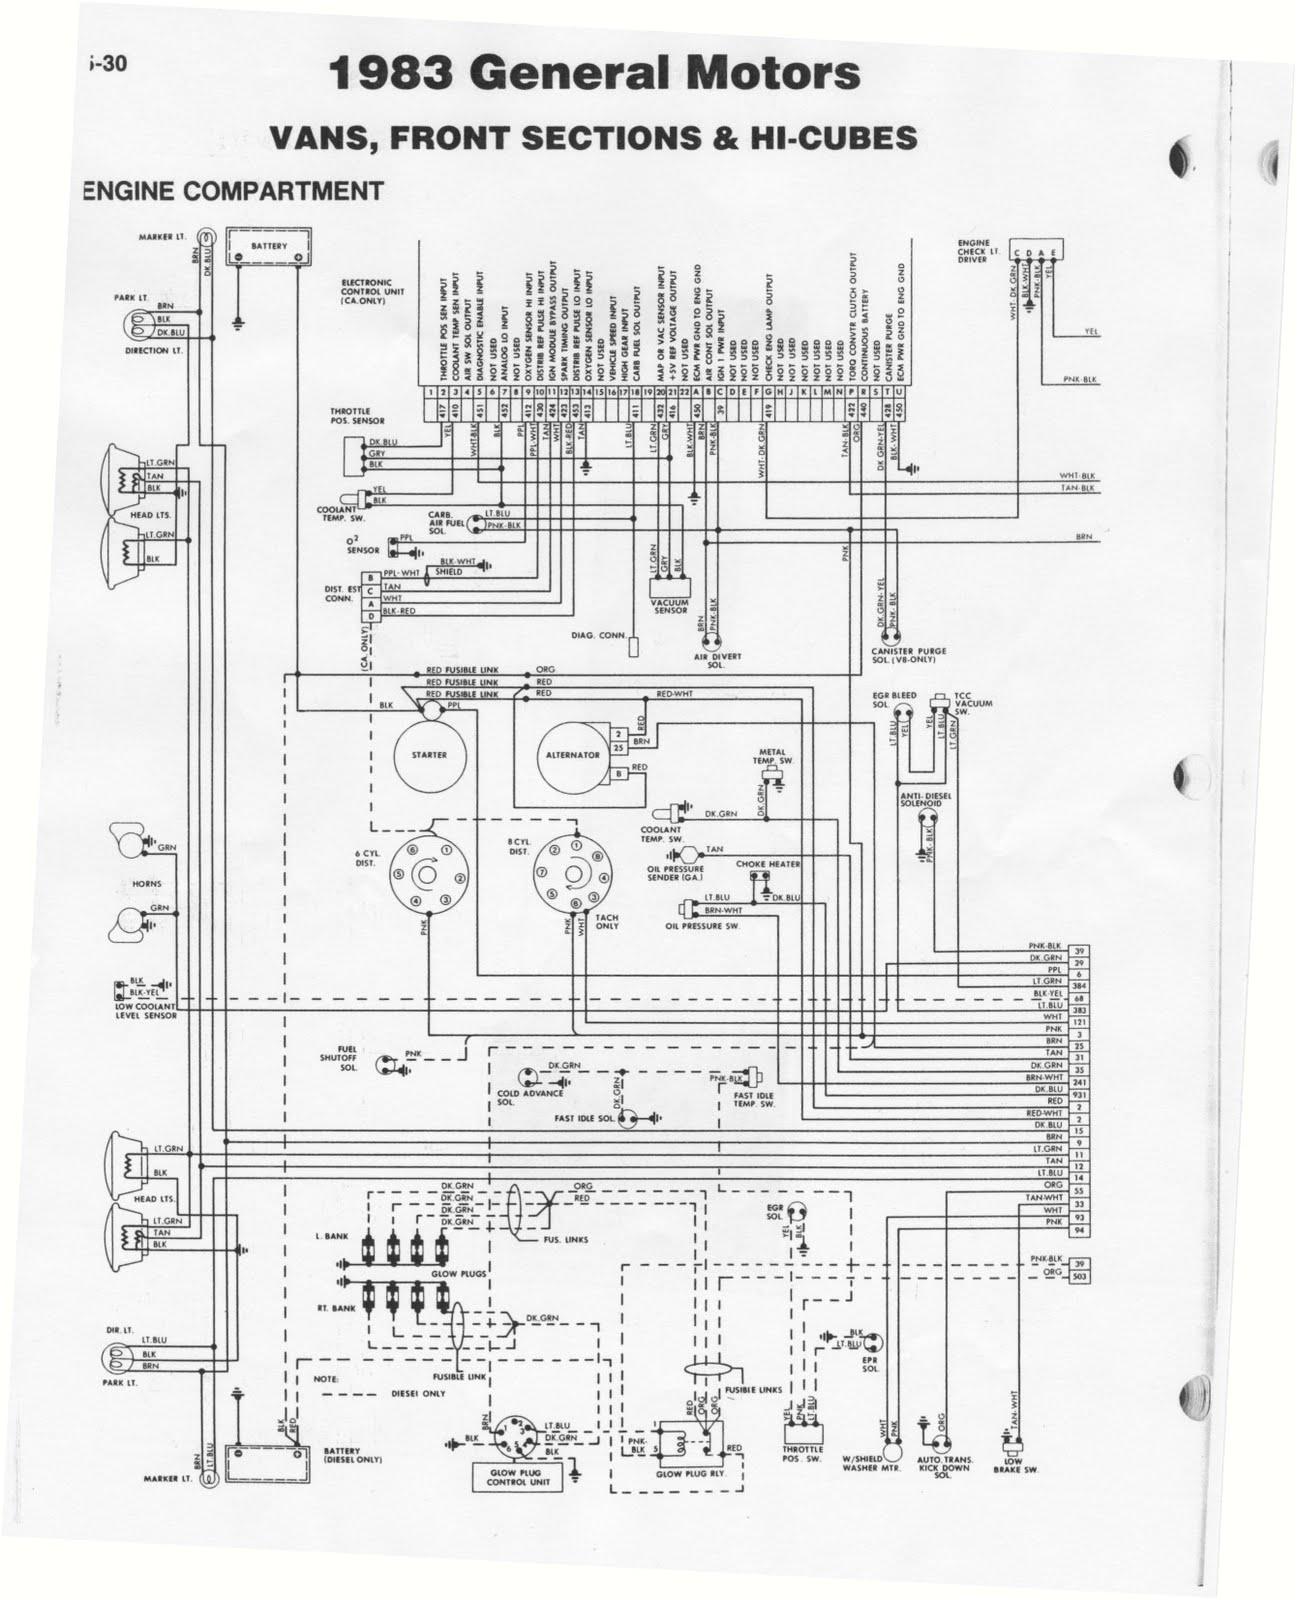 fleetwood wiring diagram data schematic diagram 1983 fleetwood rv wiring diagram